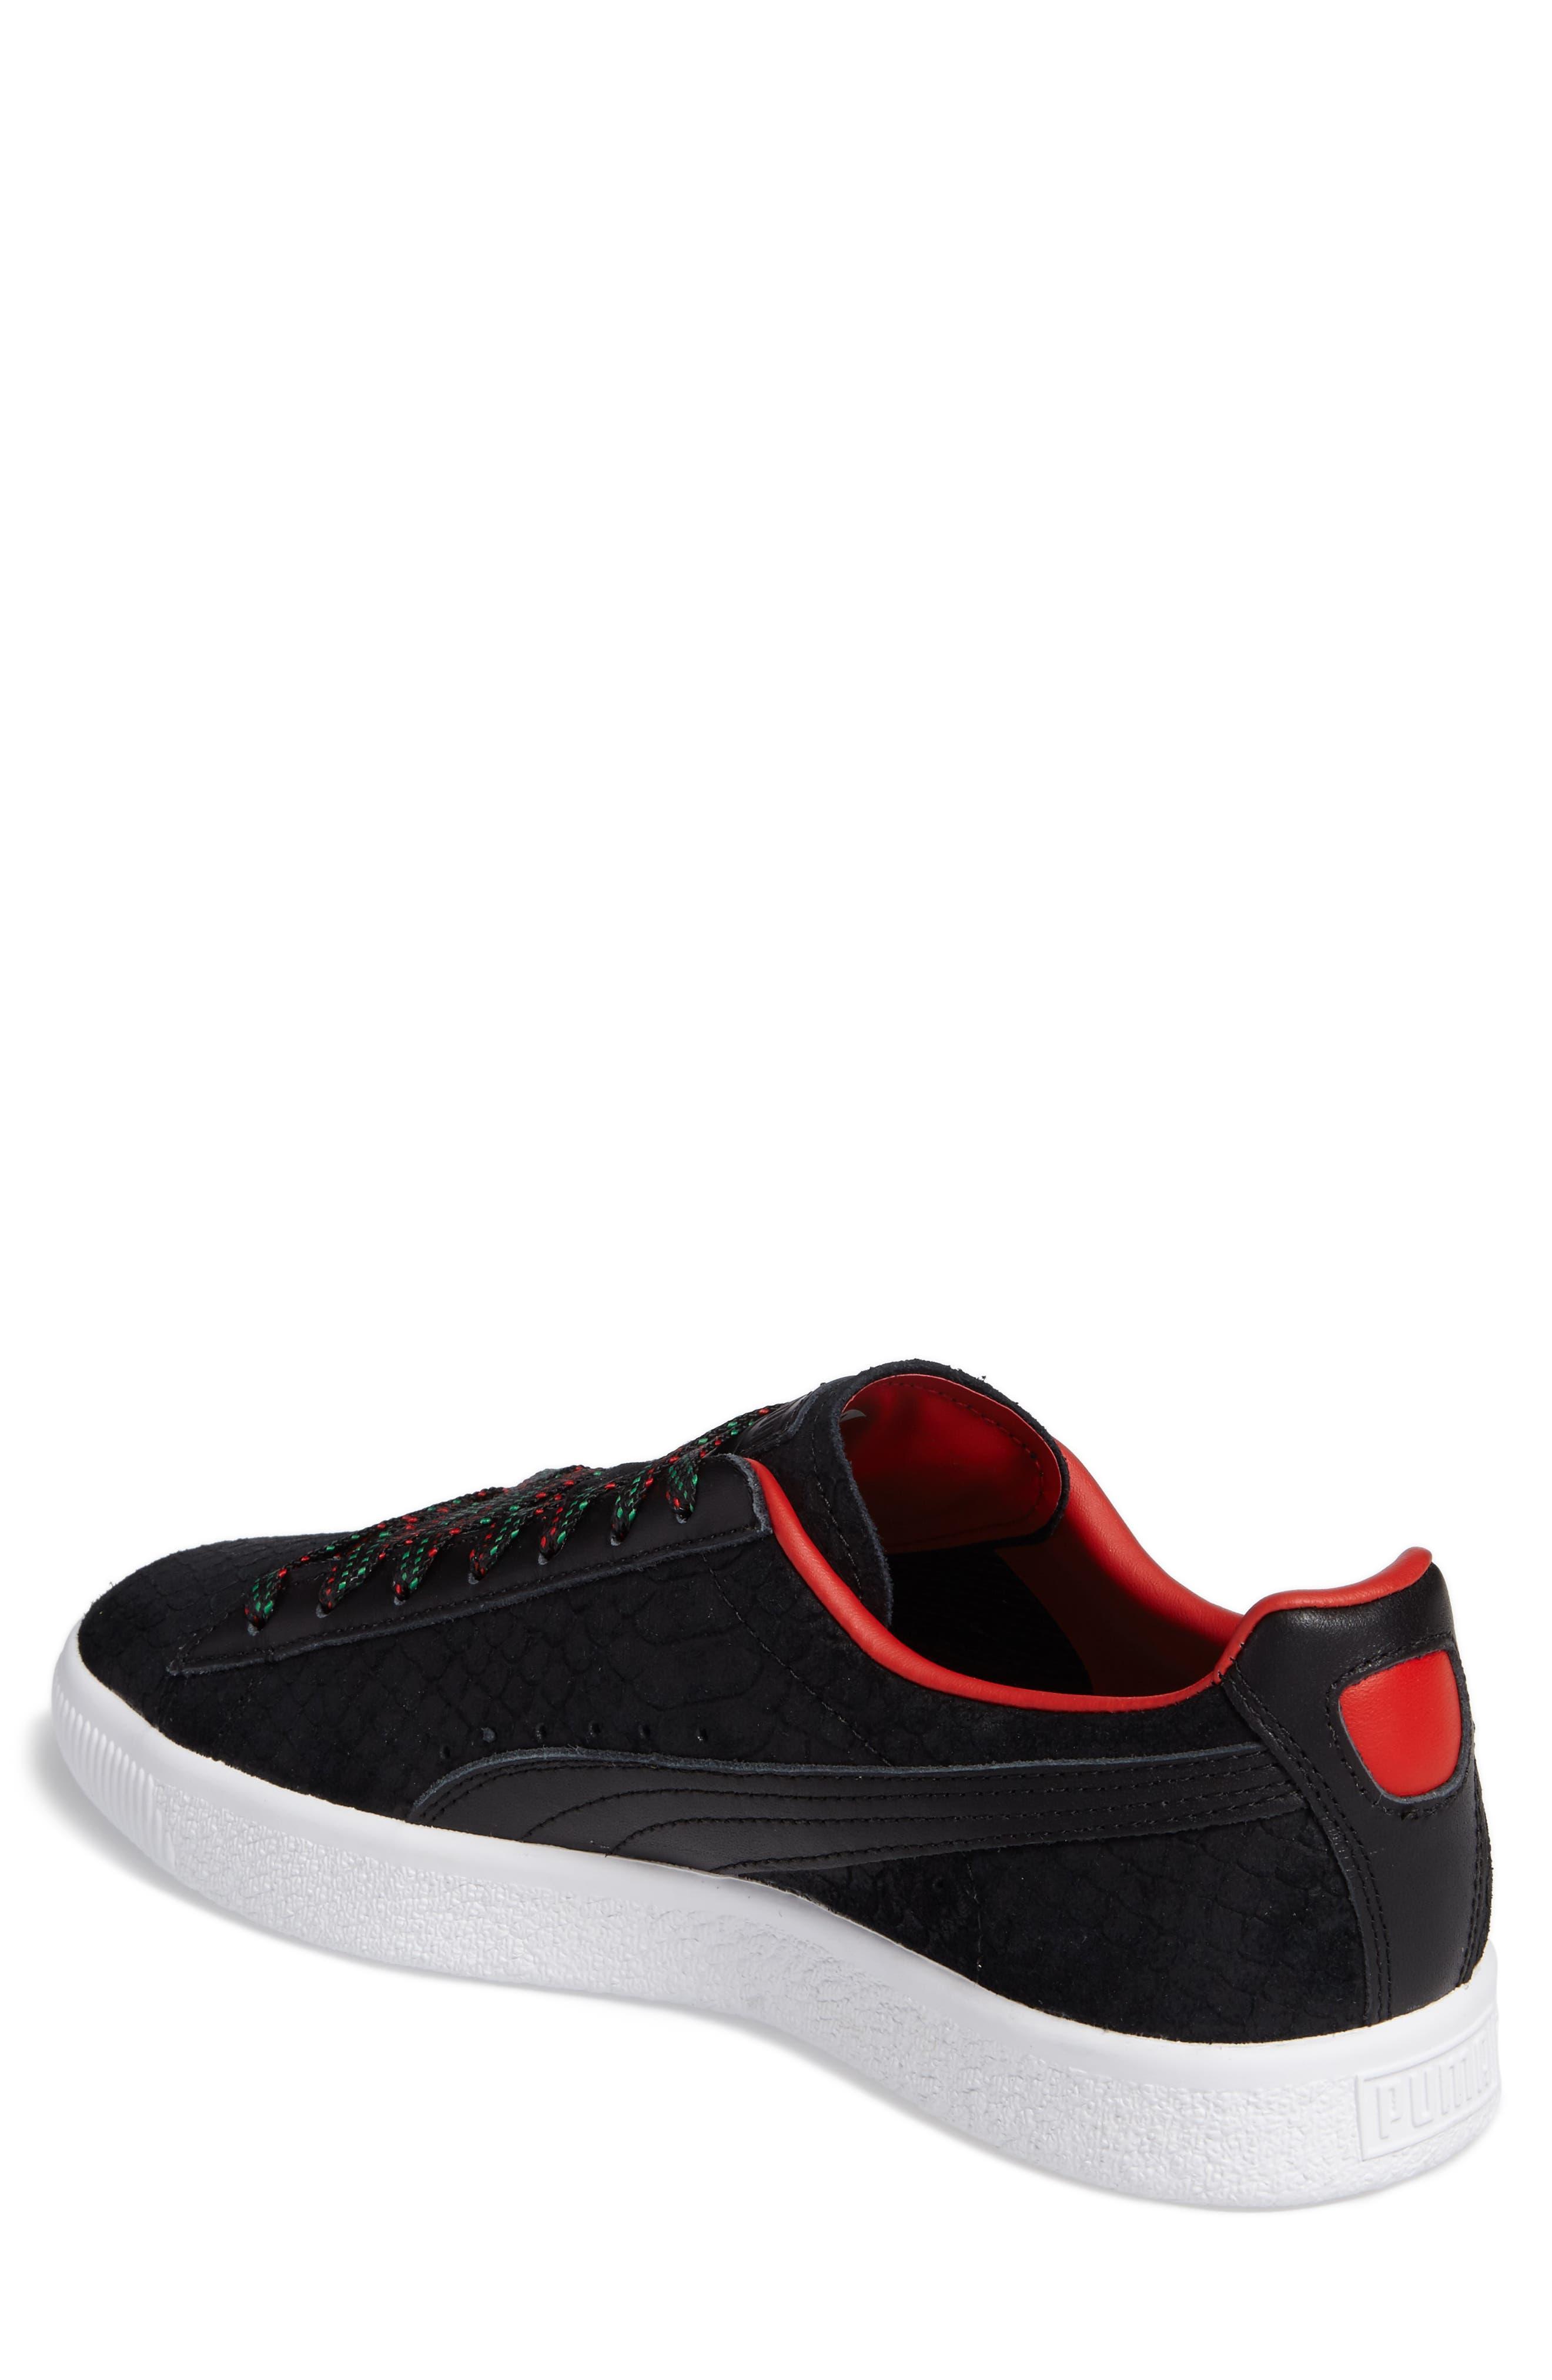 Clyde GCC Sneaker,                             Alternate thumbnail 2, color,                             001